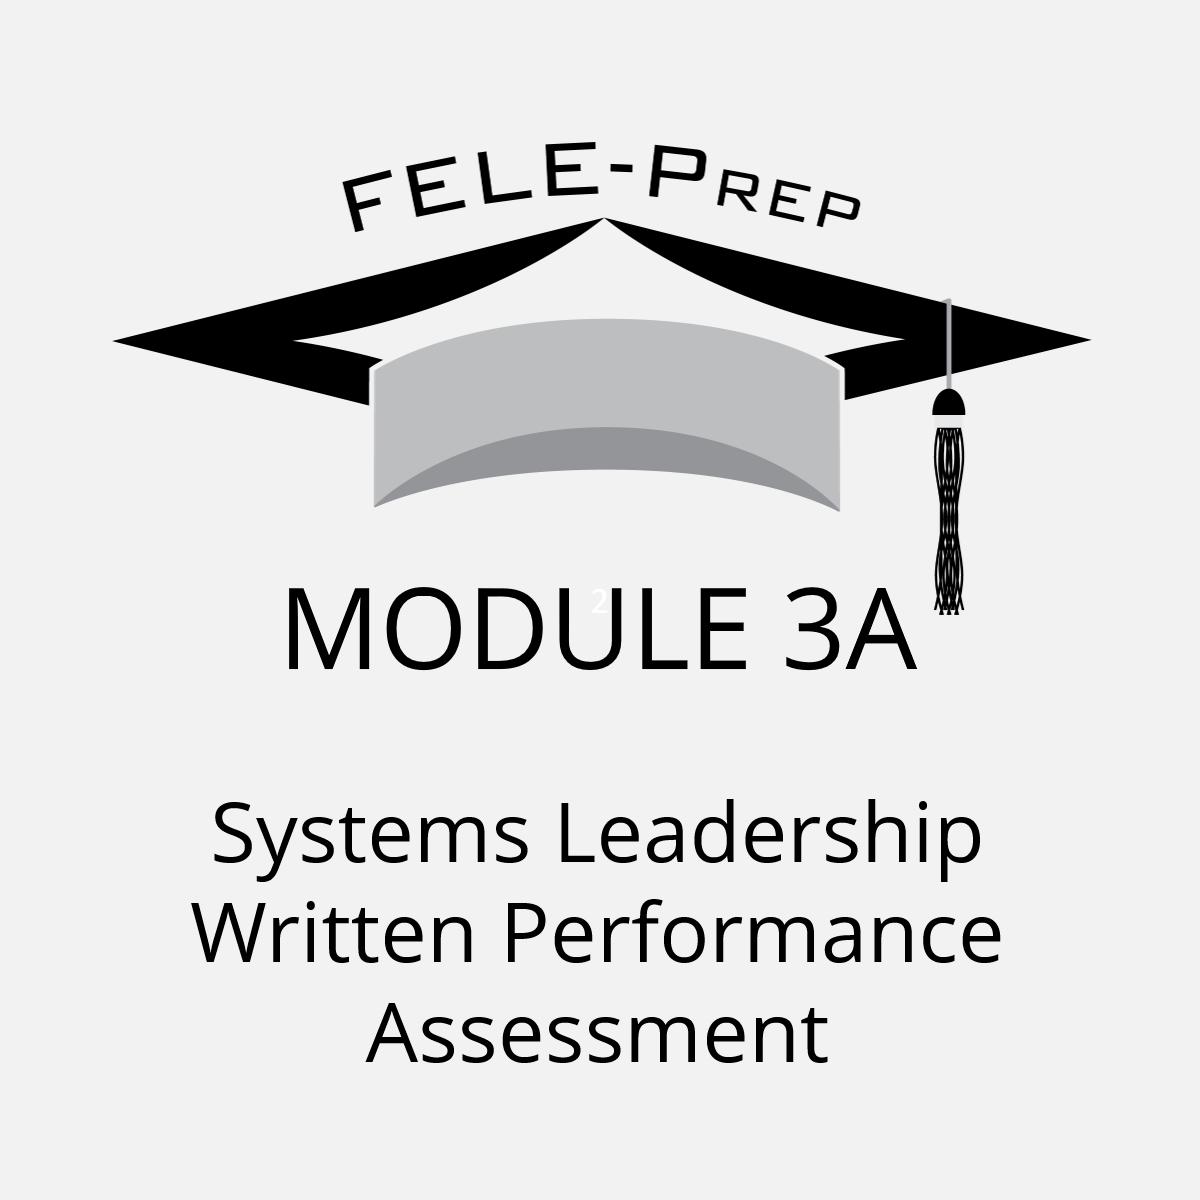 Module 3A - Systems Leadership Written Performance Assessment